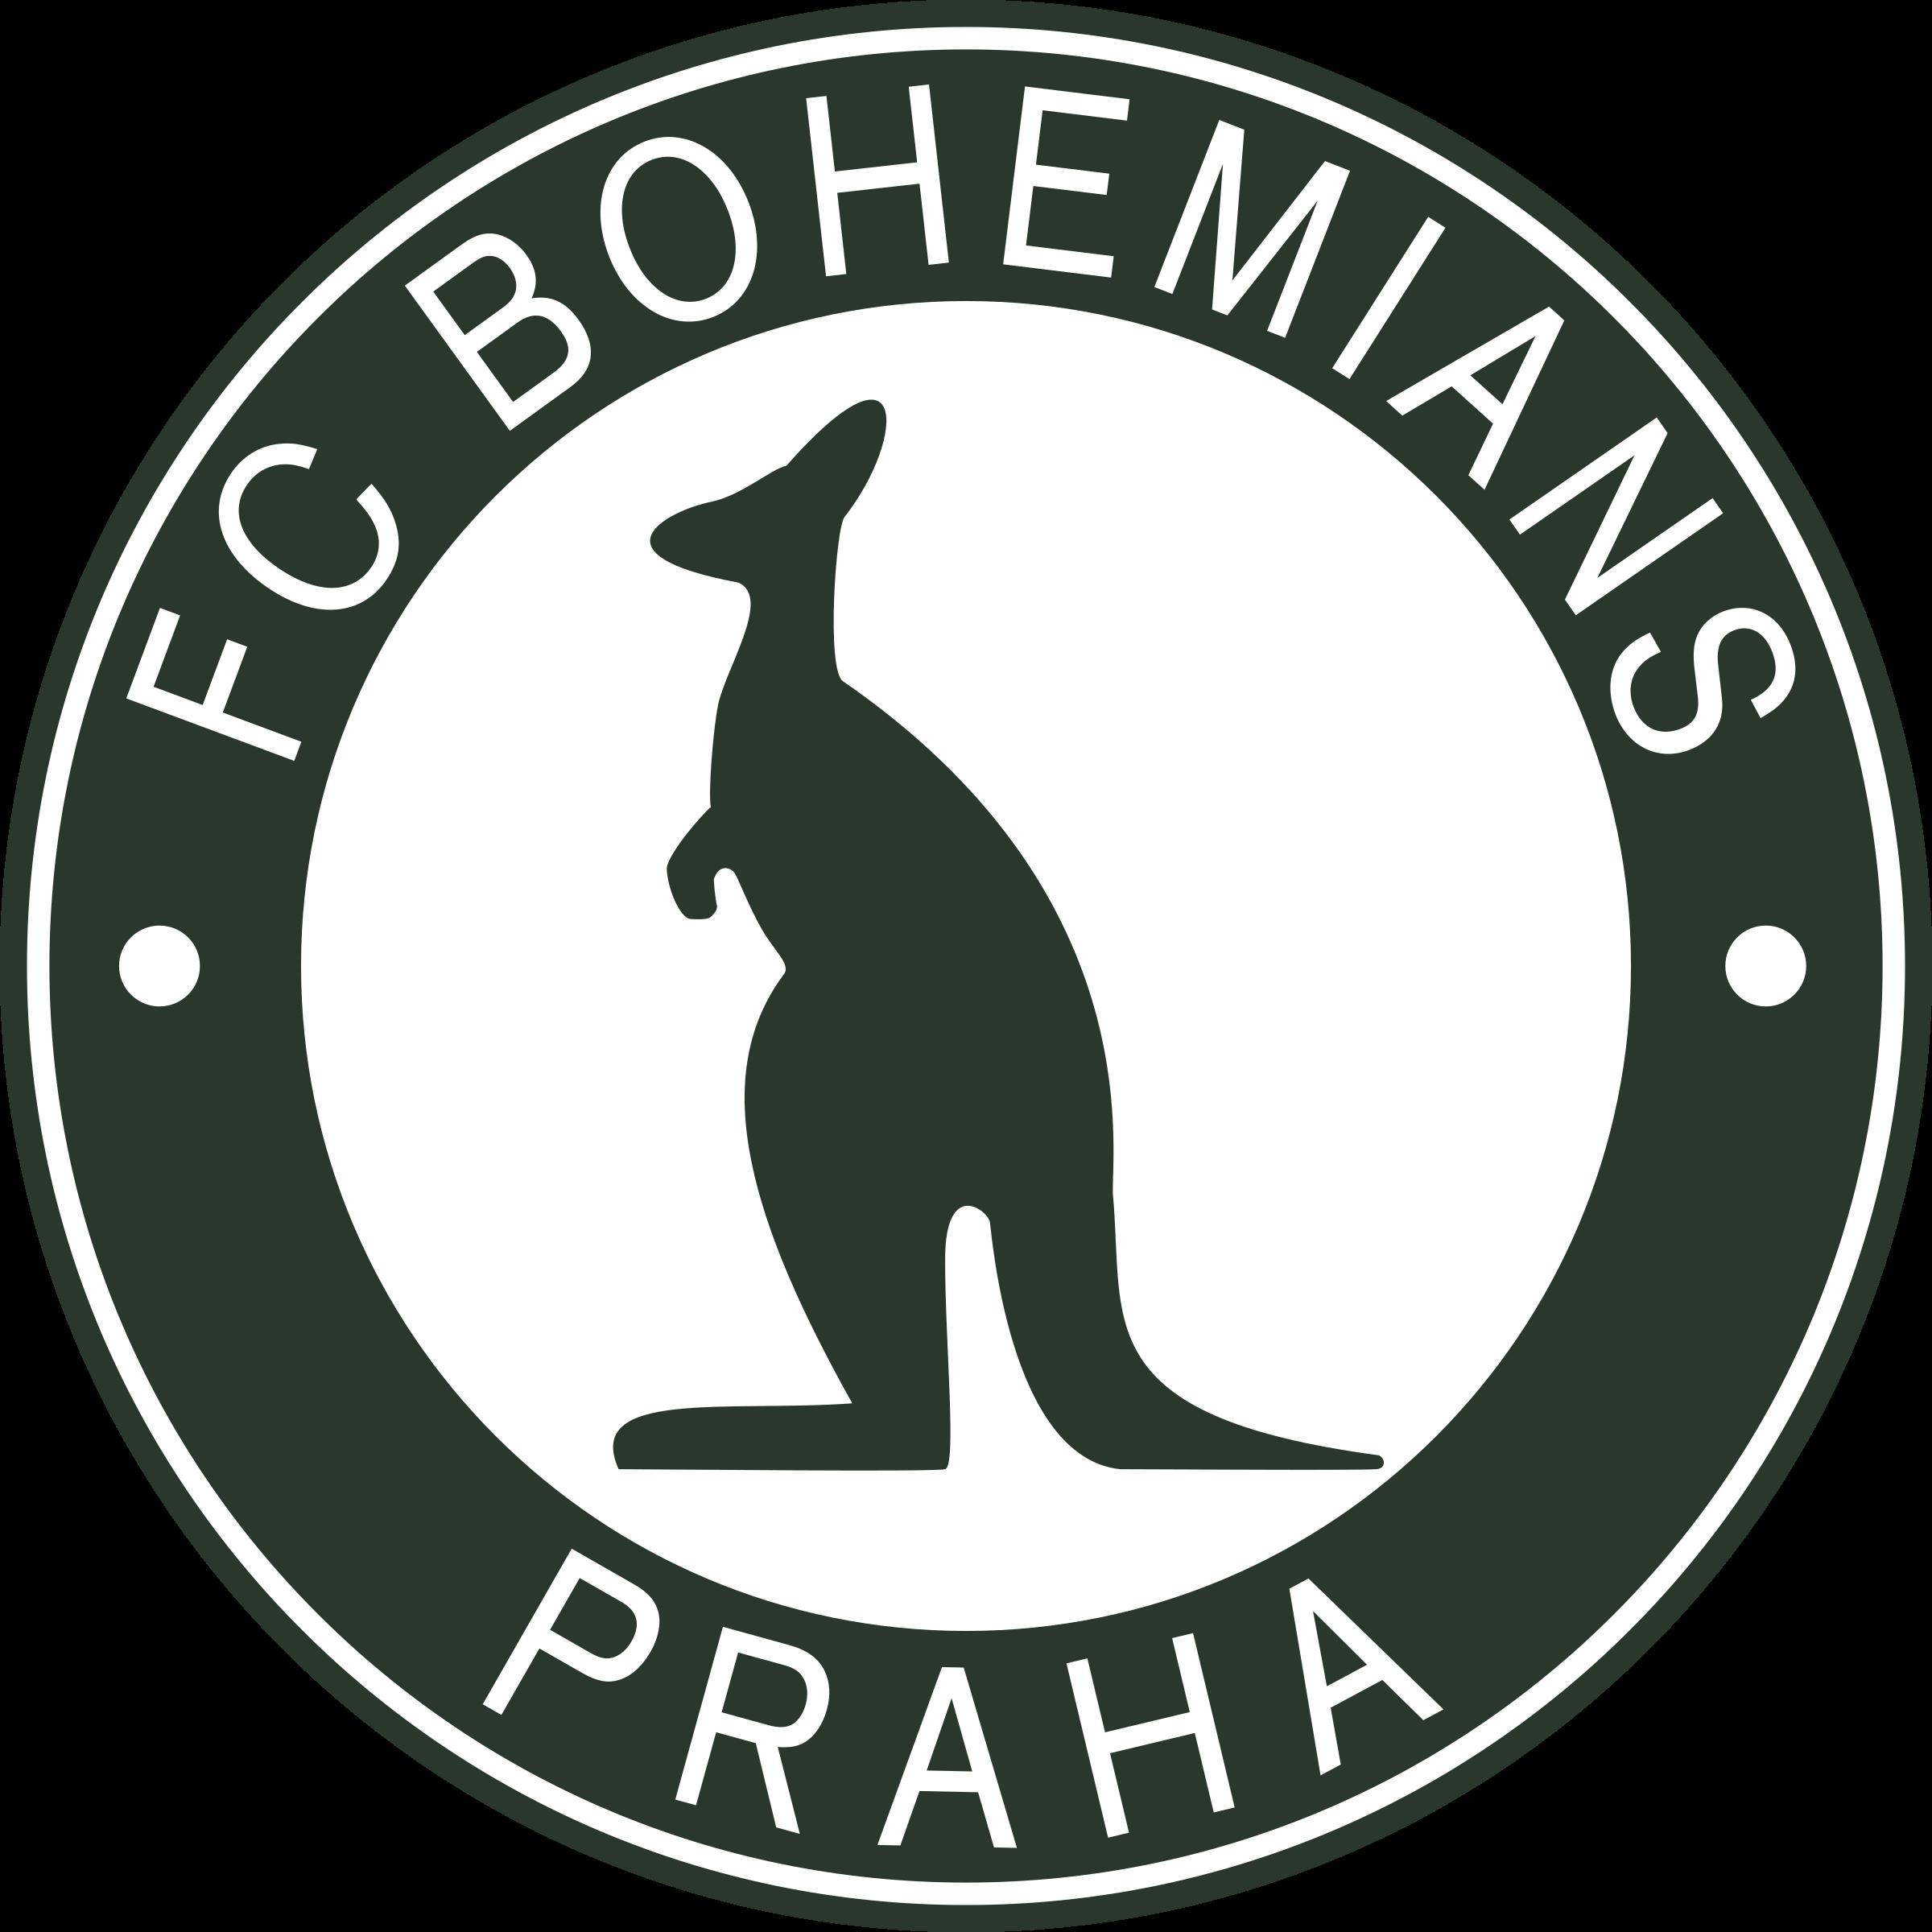 Bohemians Logo Png Transparent Svg Vector Freebie Supply